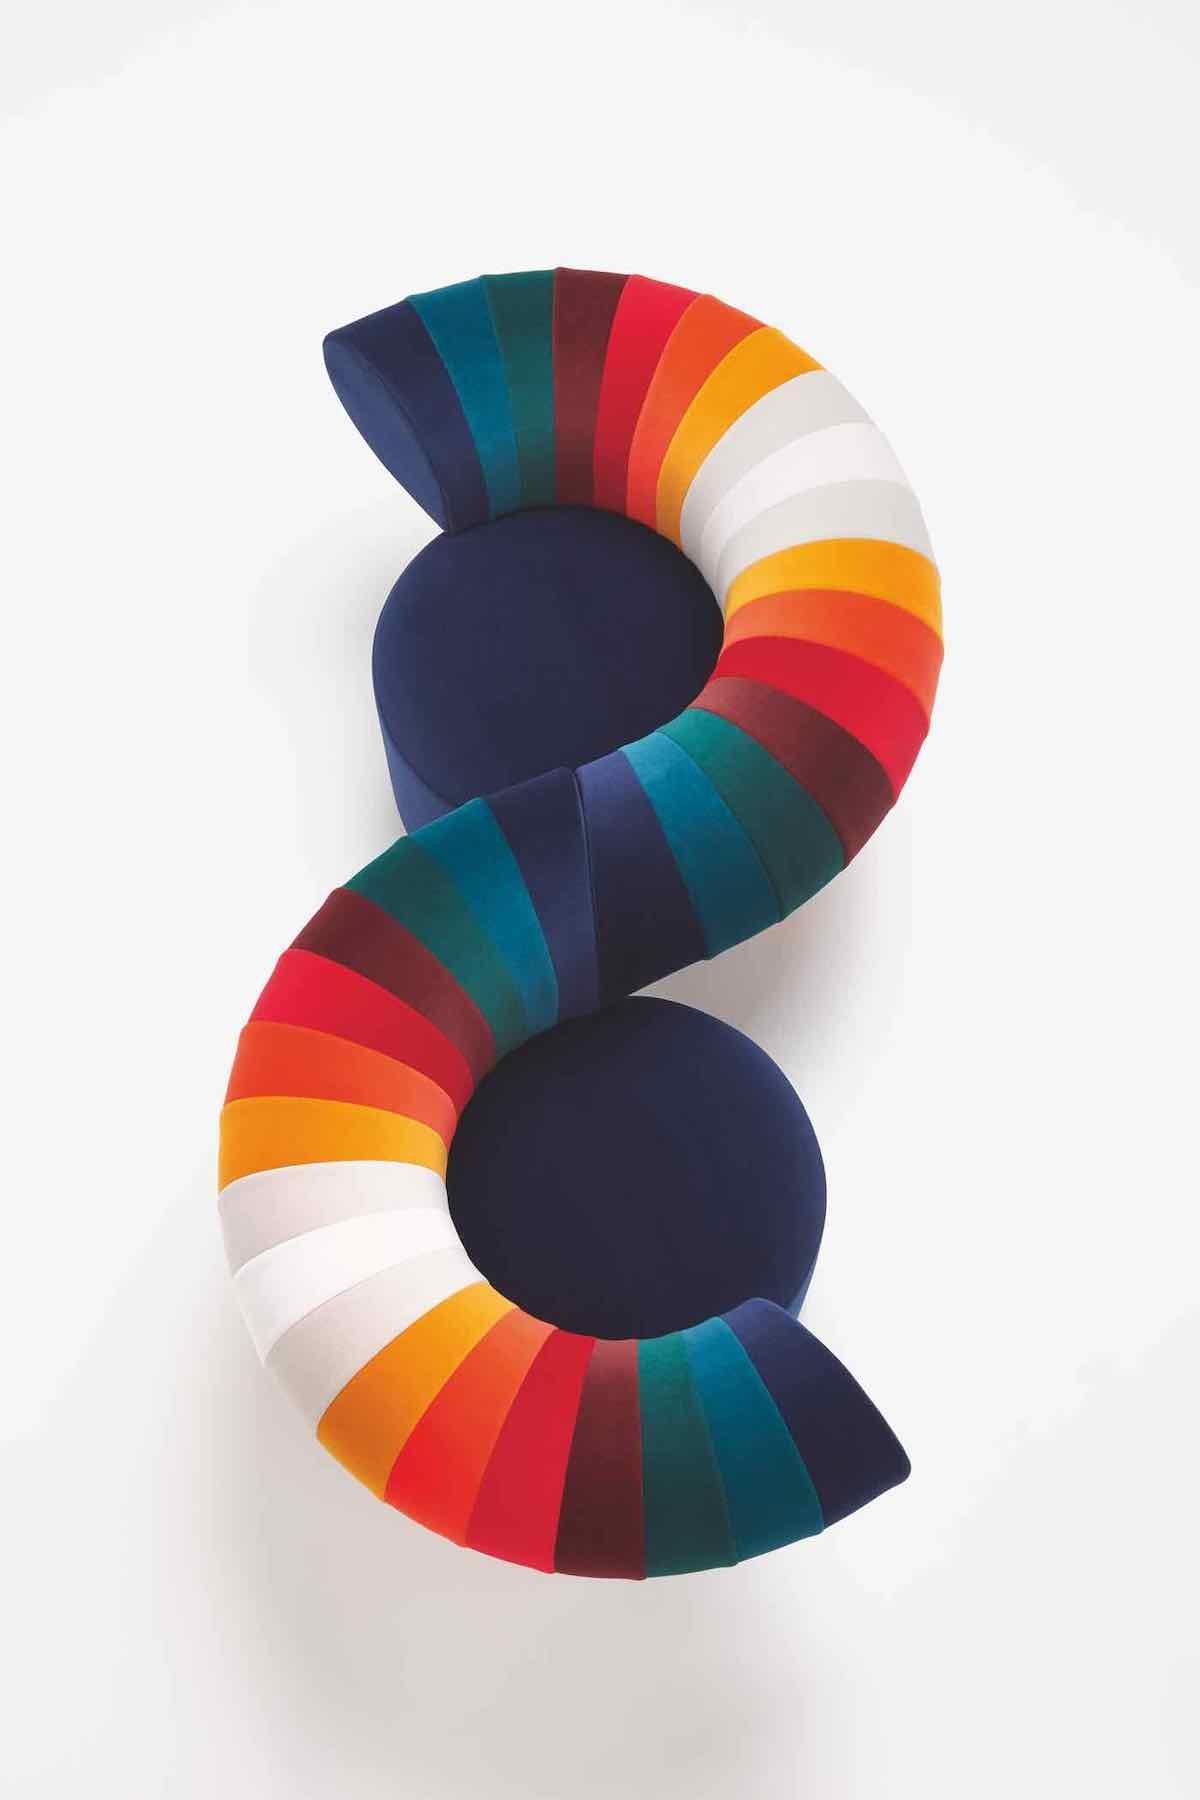 Knit Project: Adam Goodrum's Conversation Series - Photo by Luke Evans.